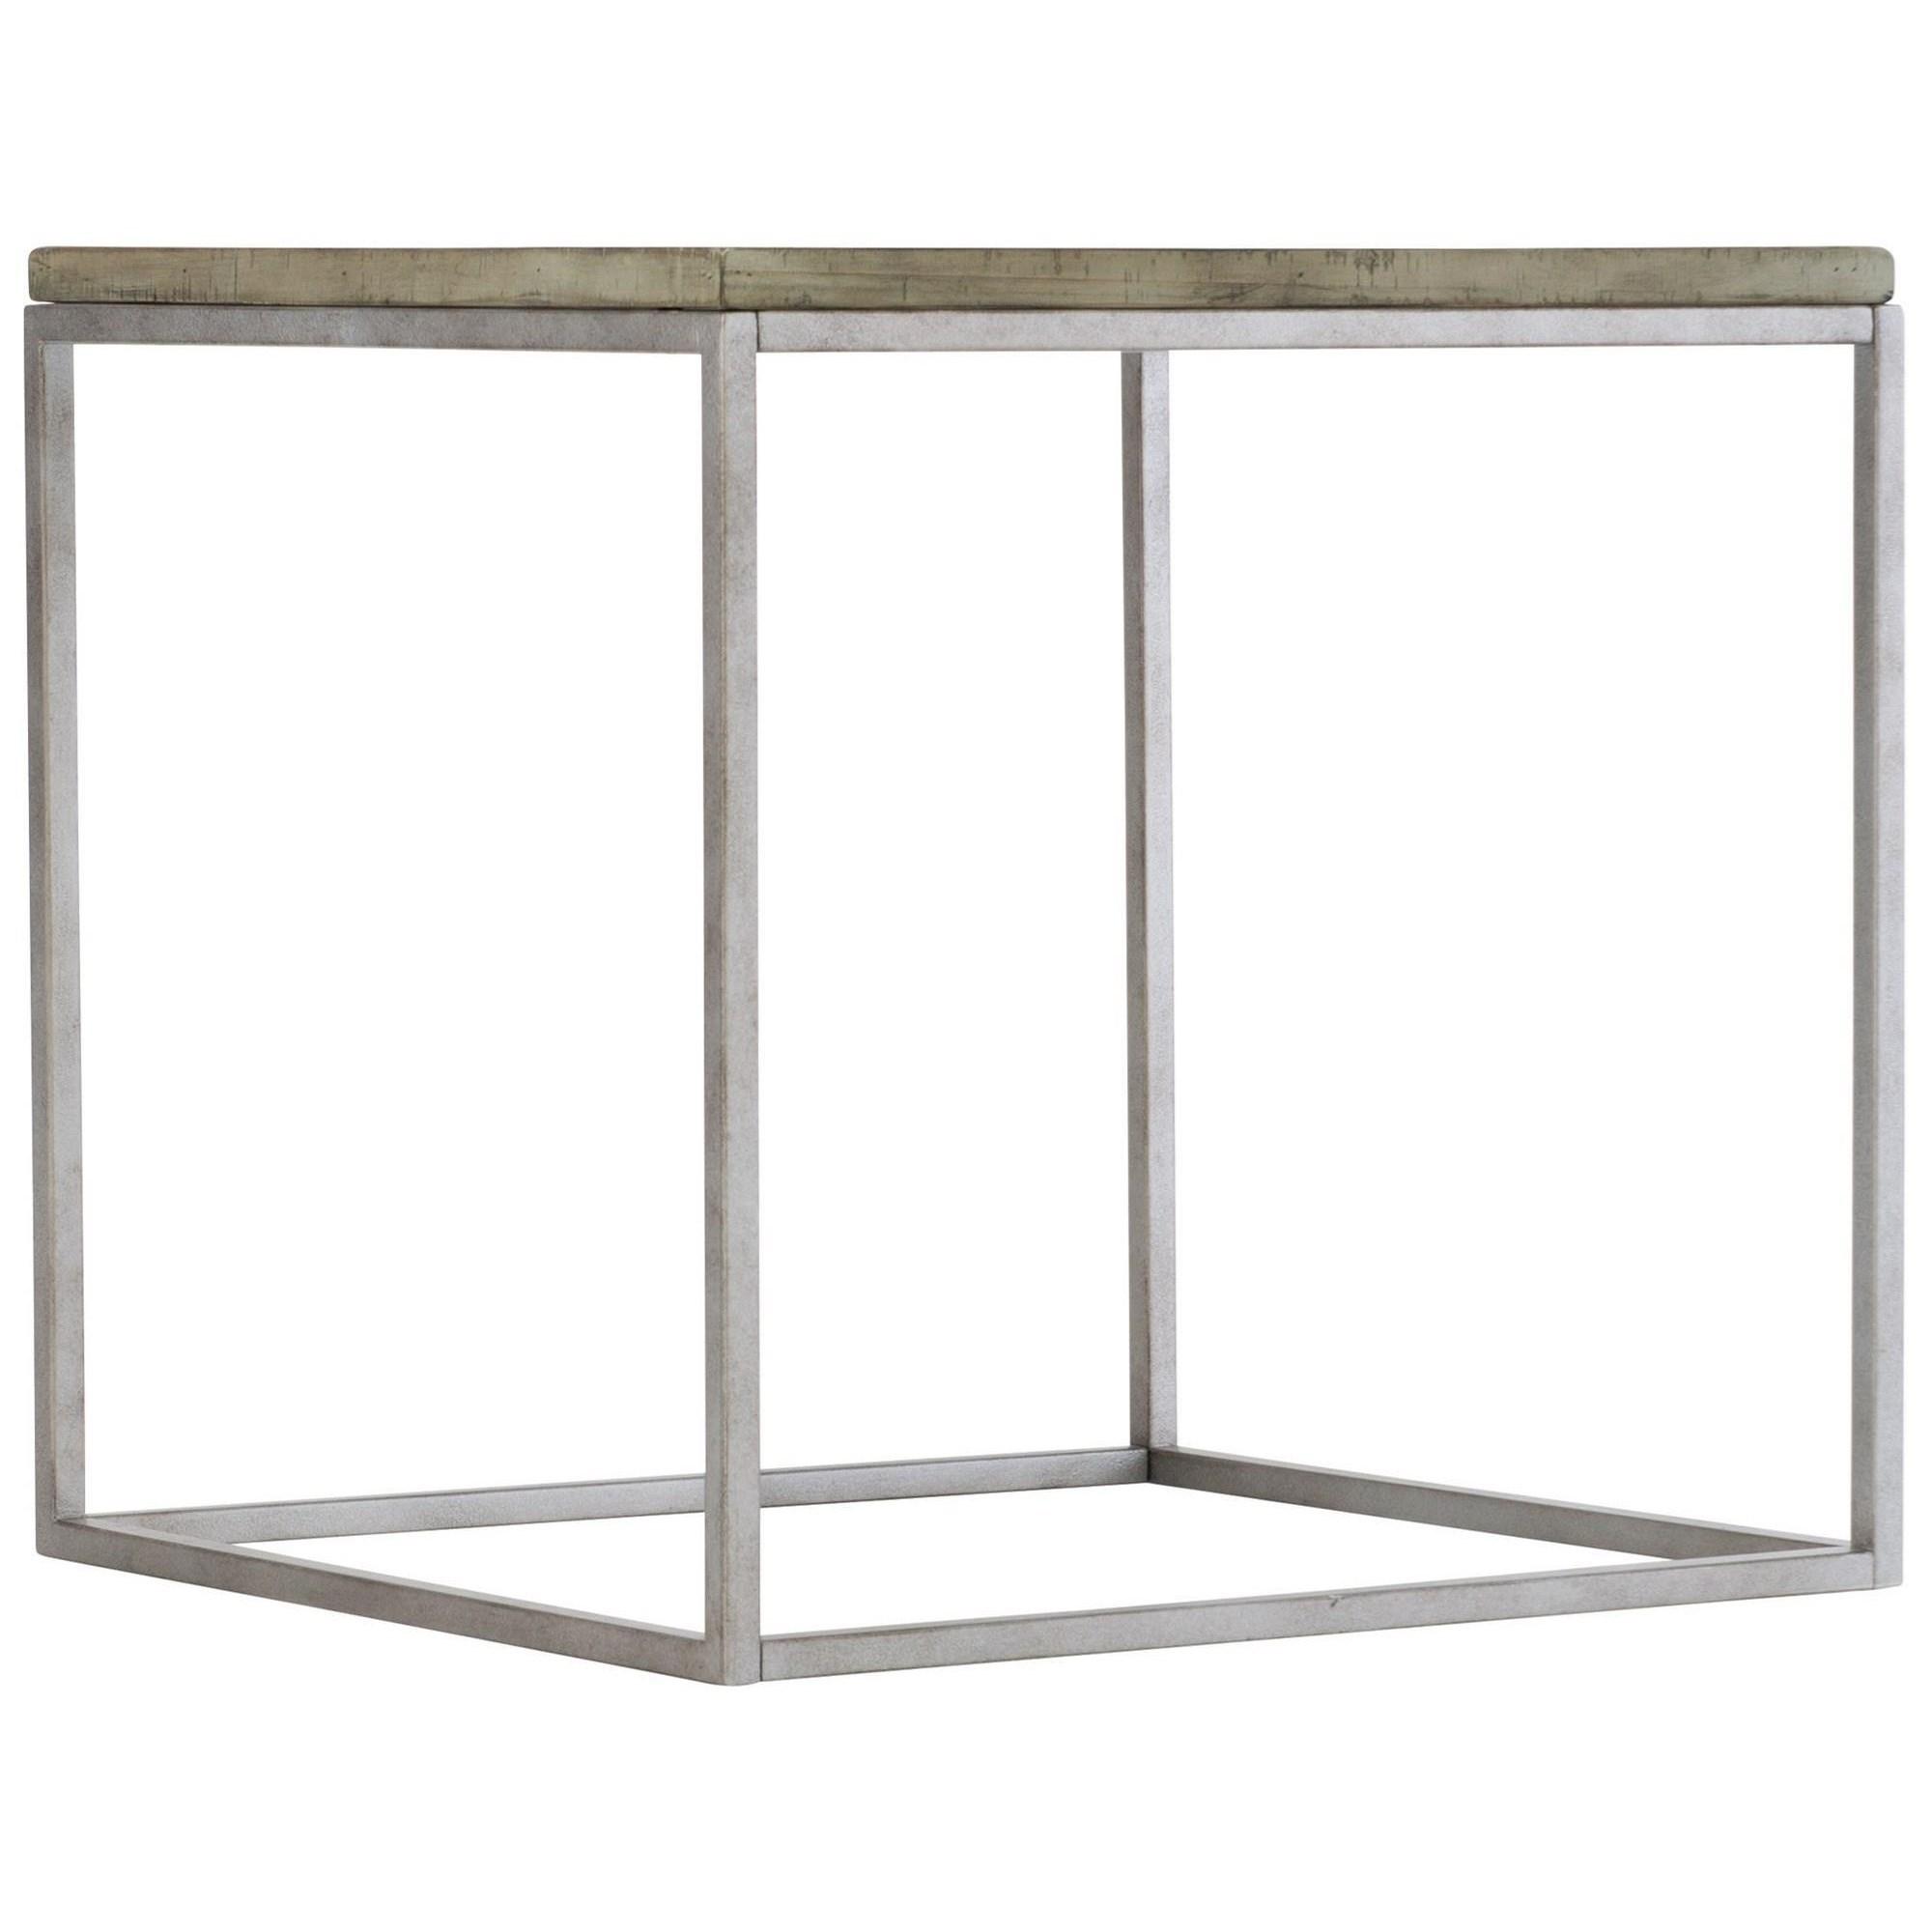 Gresham Rustic-Modern End Table with Steel Base